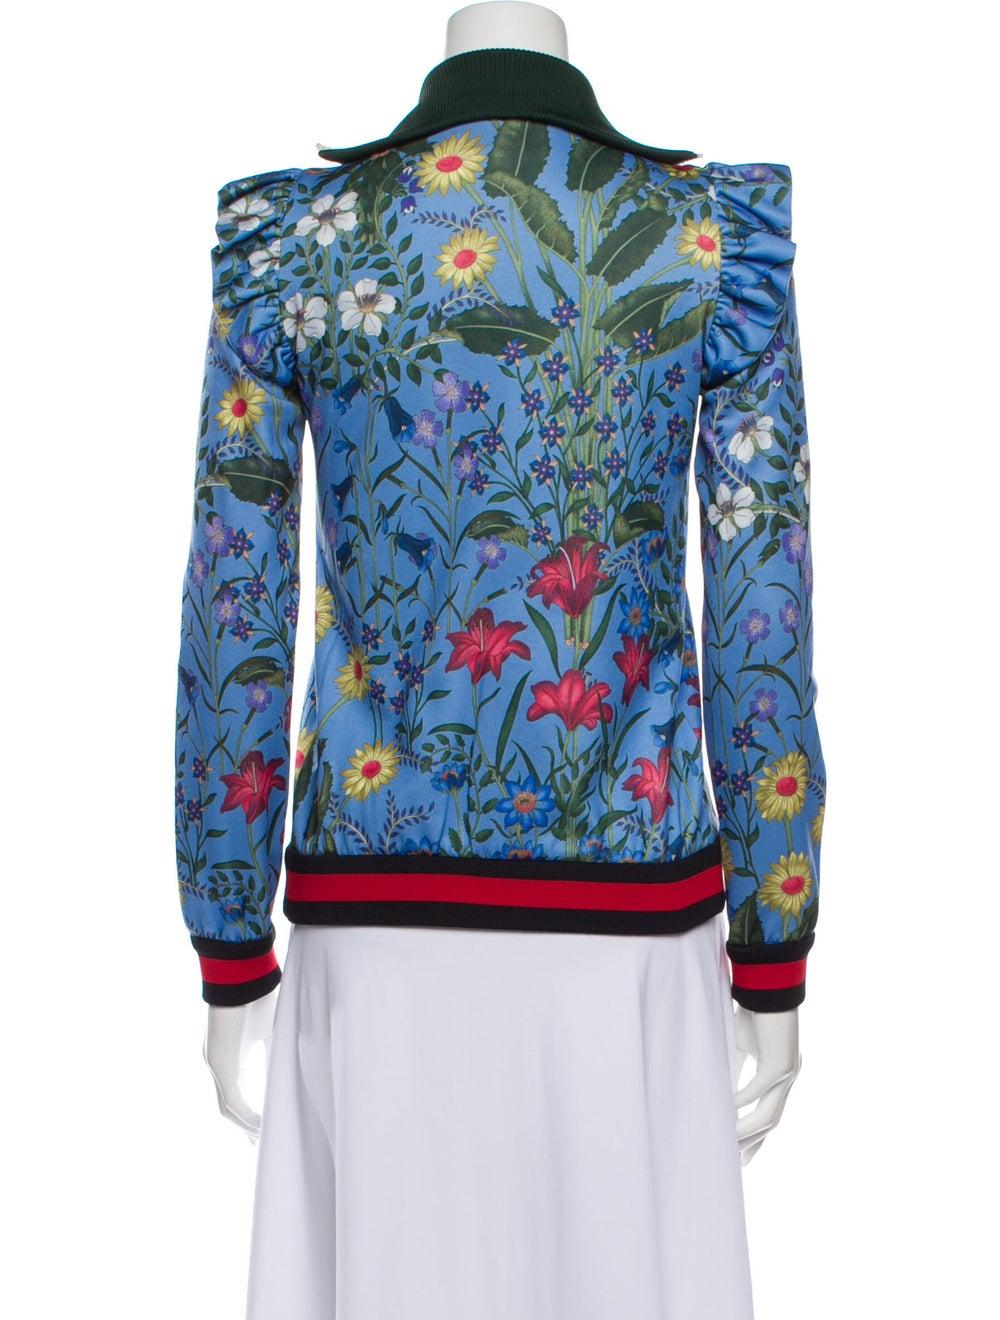 Gucci Floral Print Bomber Jacket Blue - image 3